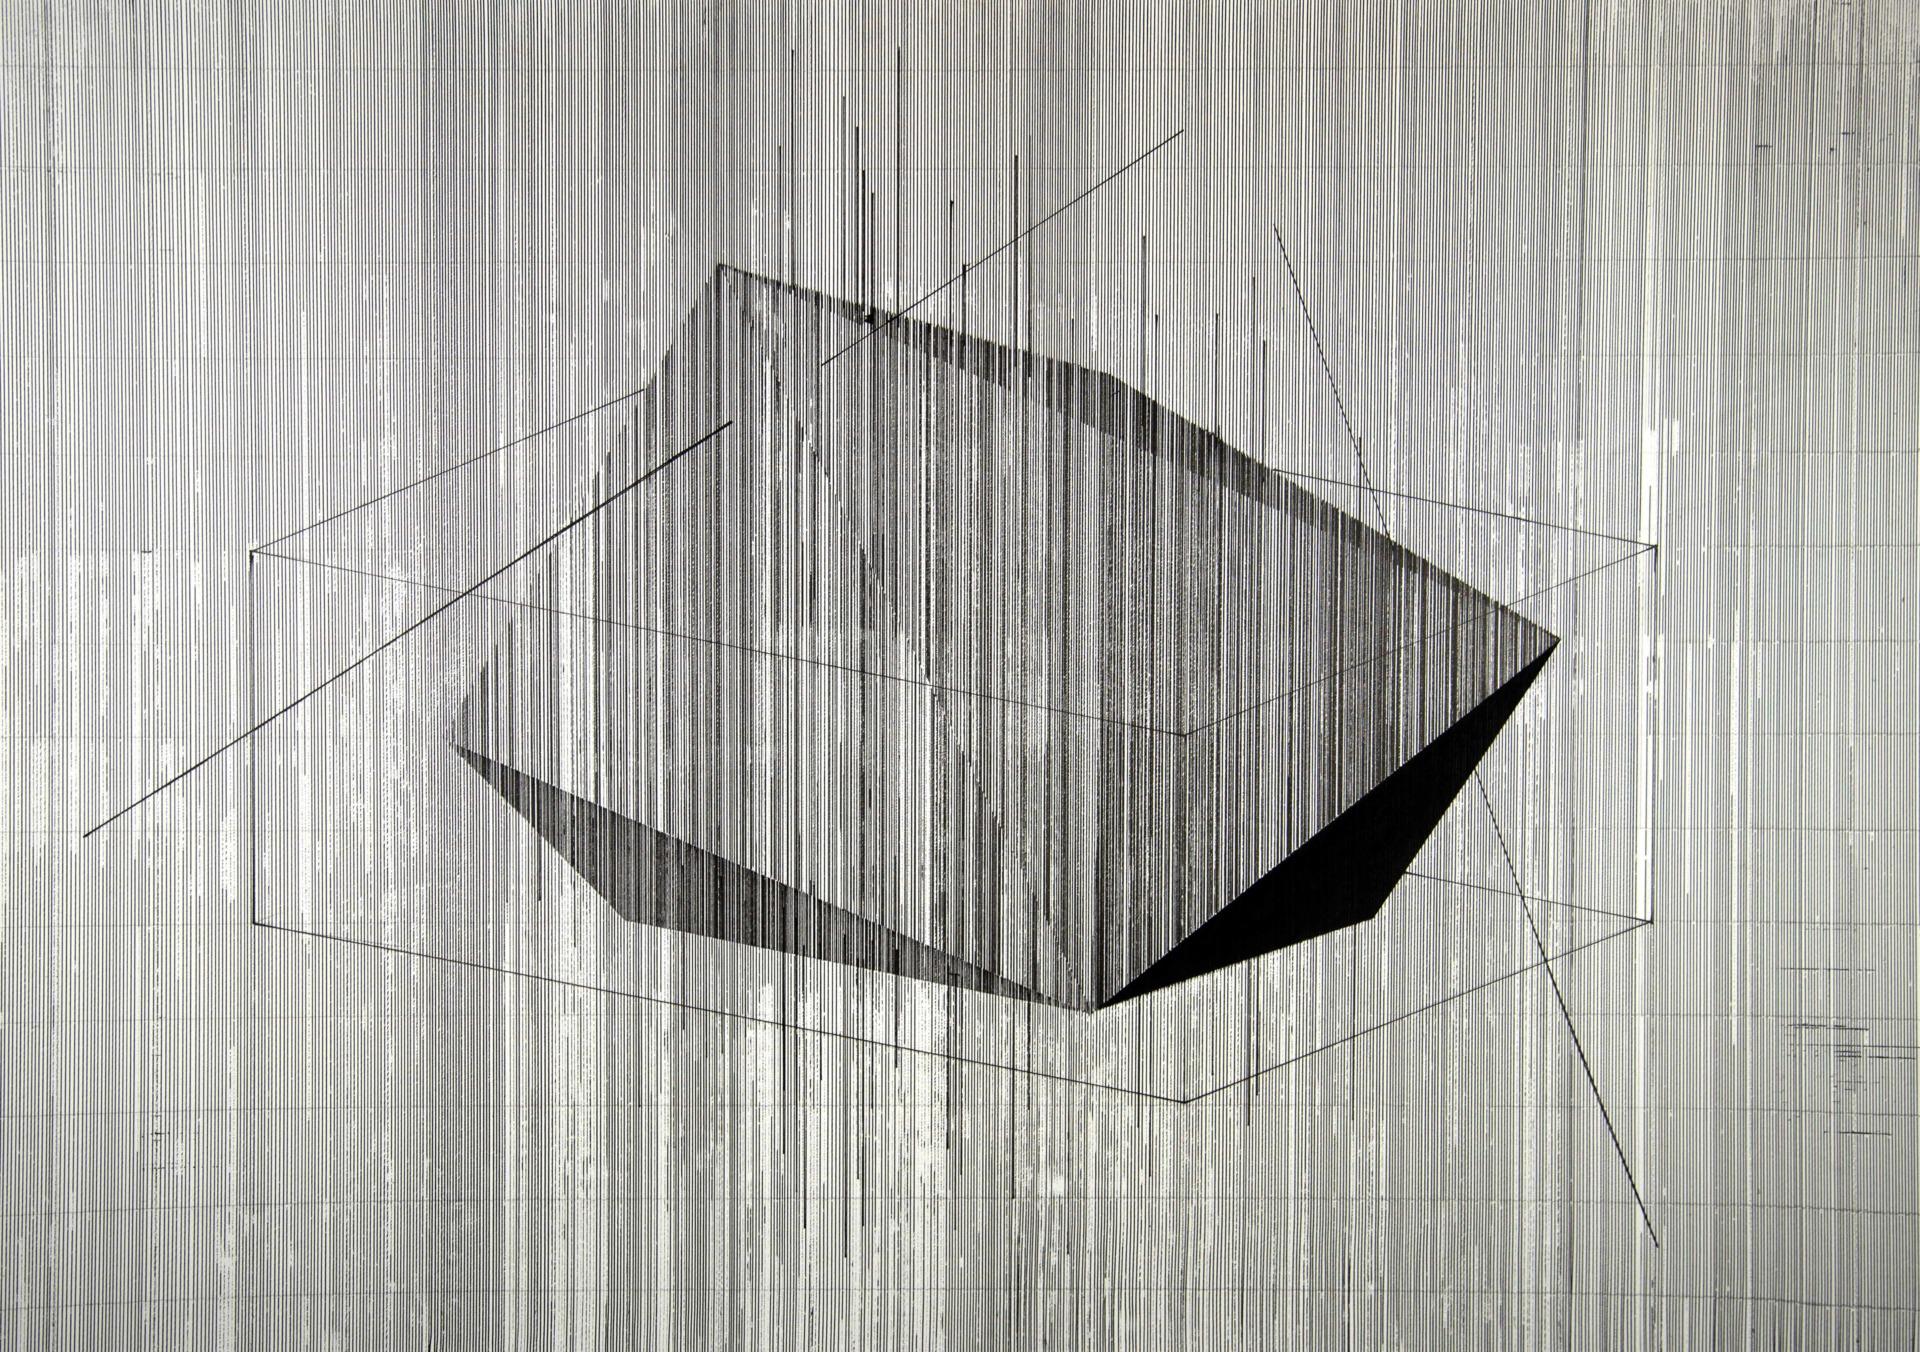 Contemporary art from Gyula Sági | Op. 160121. 9